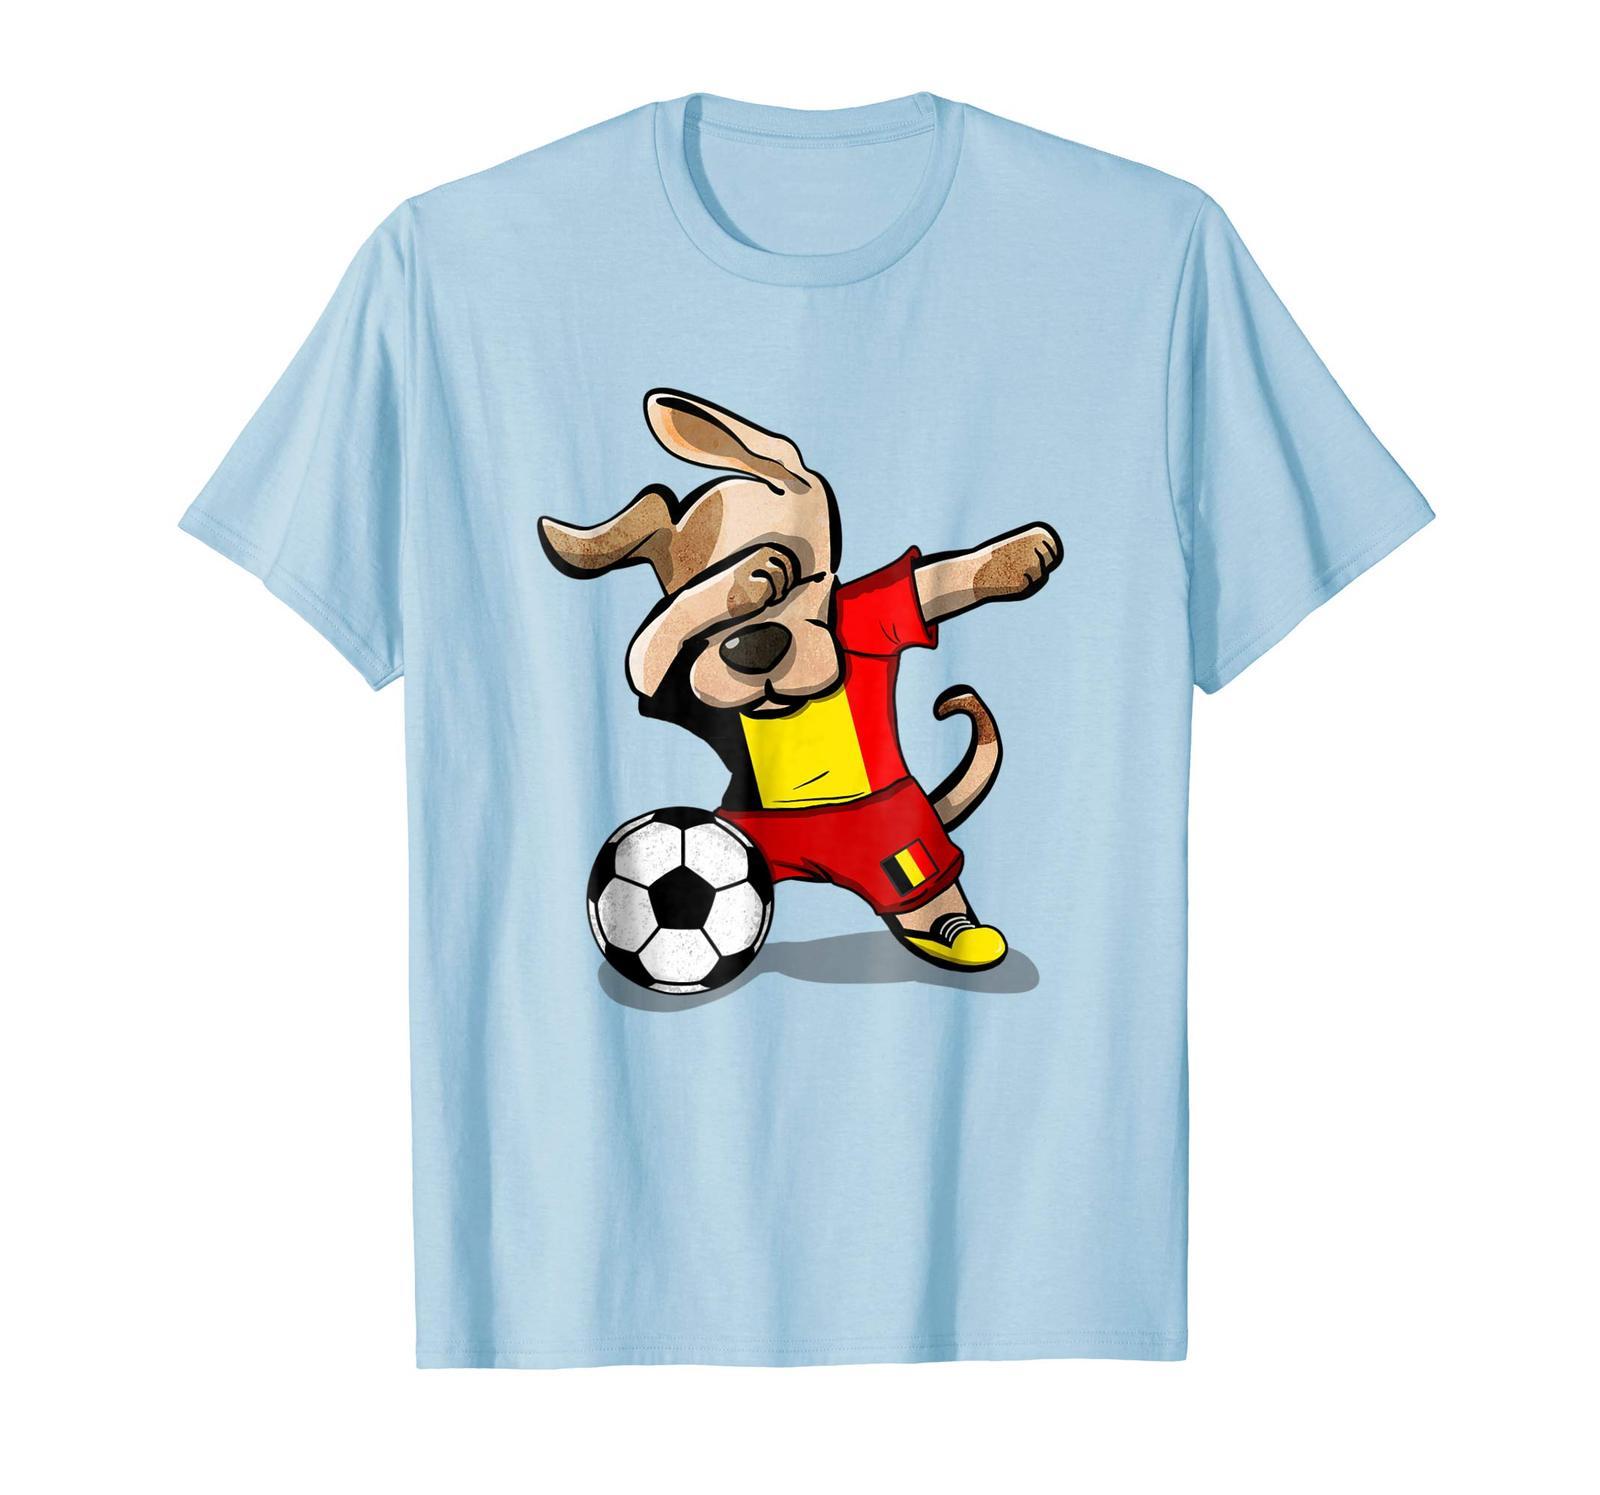 0de2aa247ca New Shirts - Dog Dabbing Soccer Belgium and 50 similar items. B1vjl6mug1s.  cla 7c2140 2000 7c91o7fkcgz9l.png 7c0 0 2140 2000 0.0 0.0 2140.0 2000.0